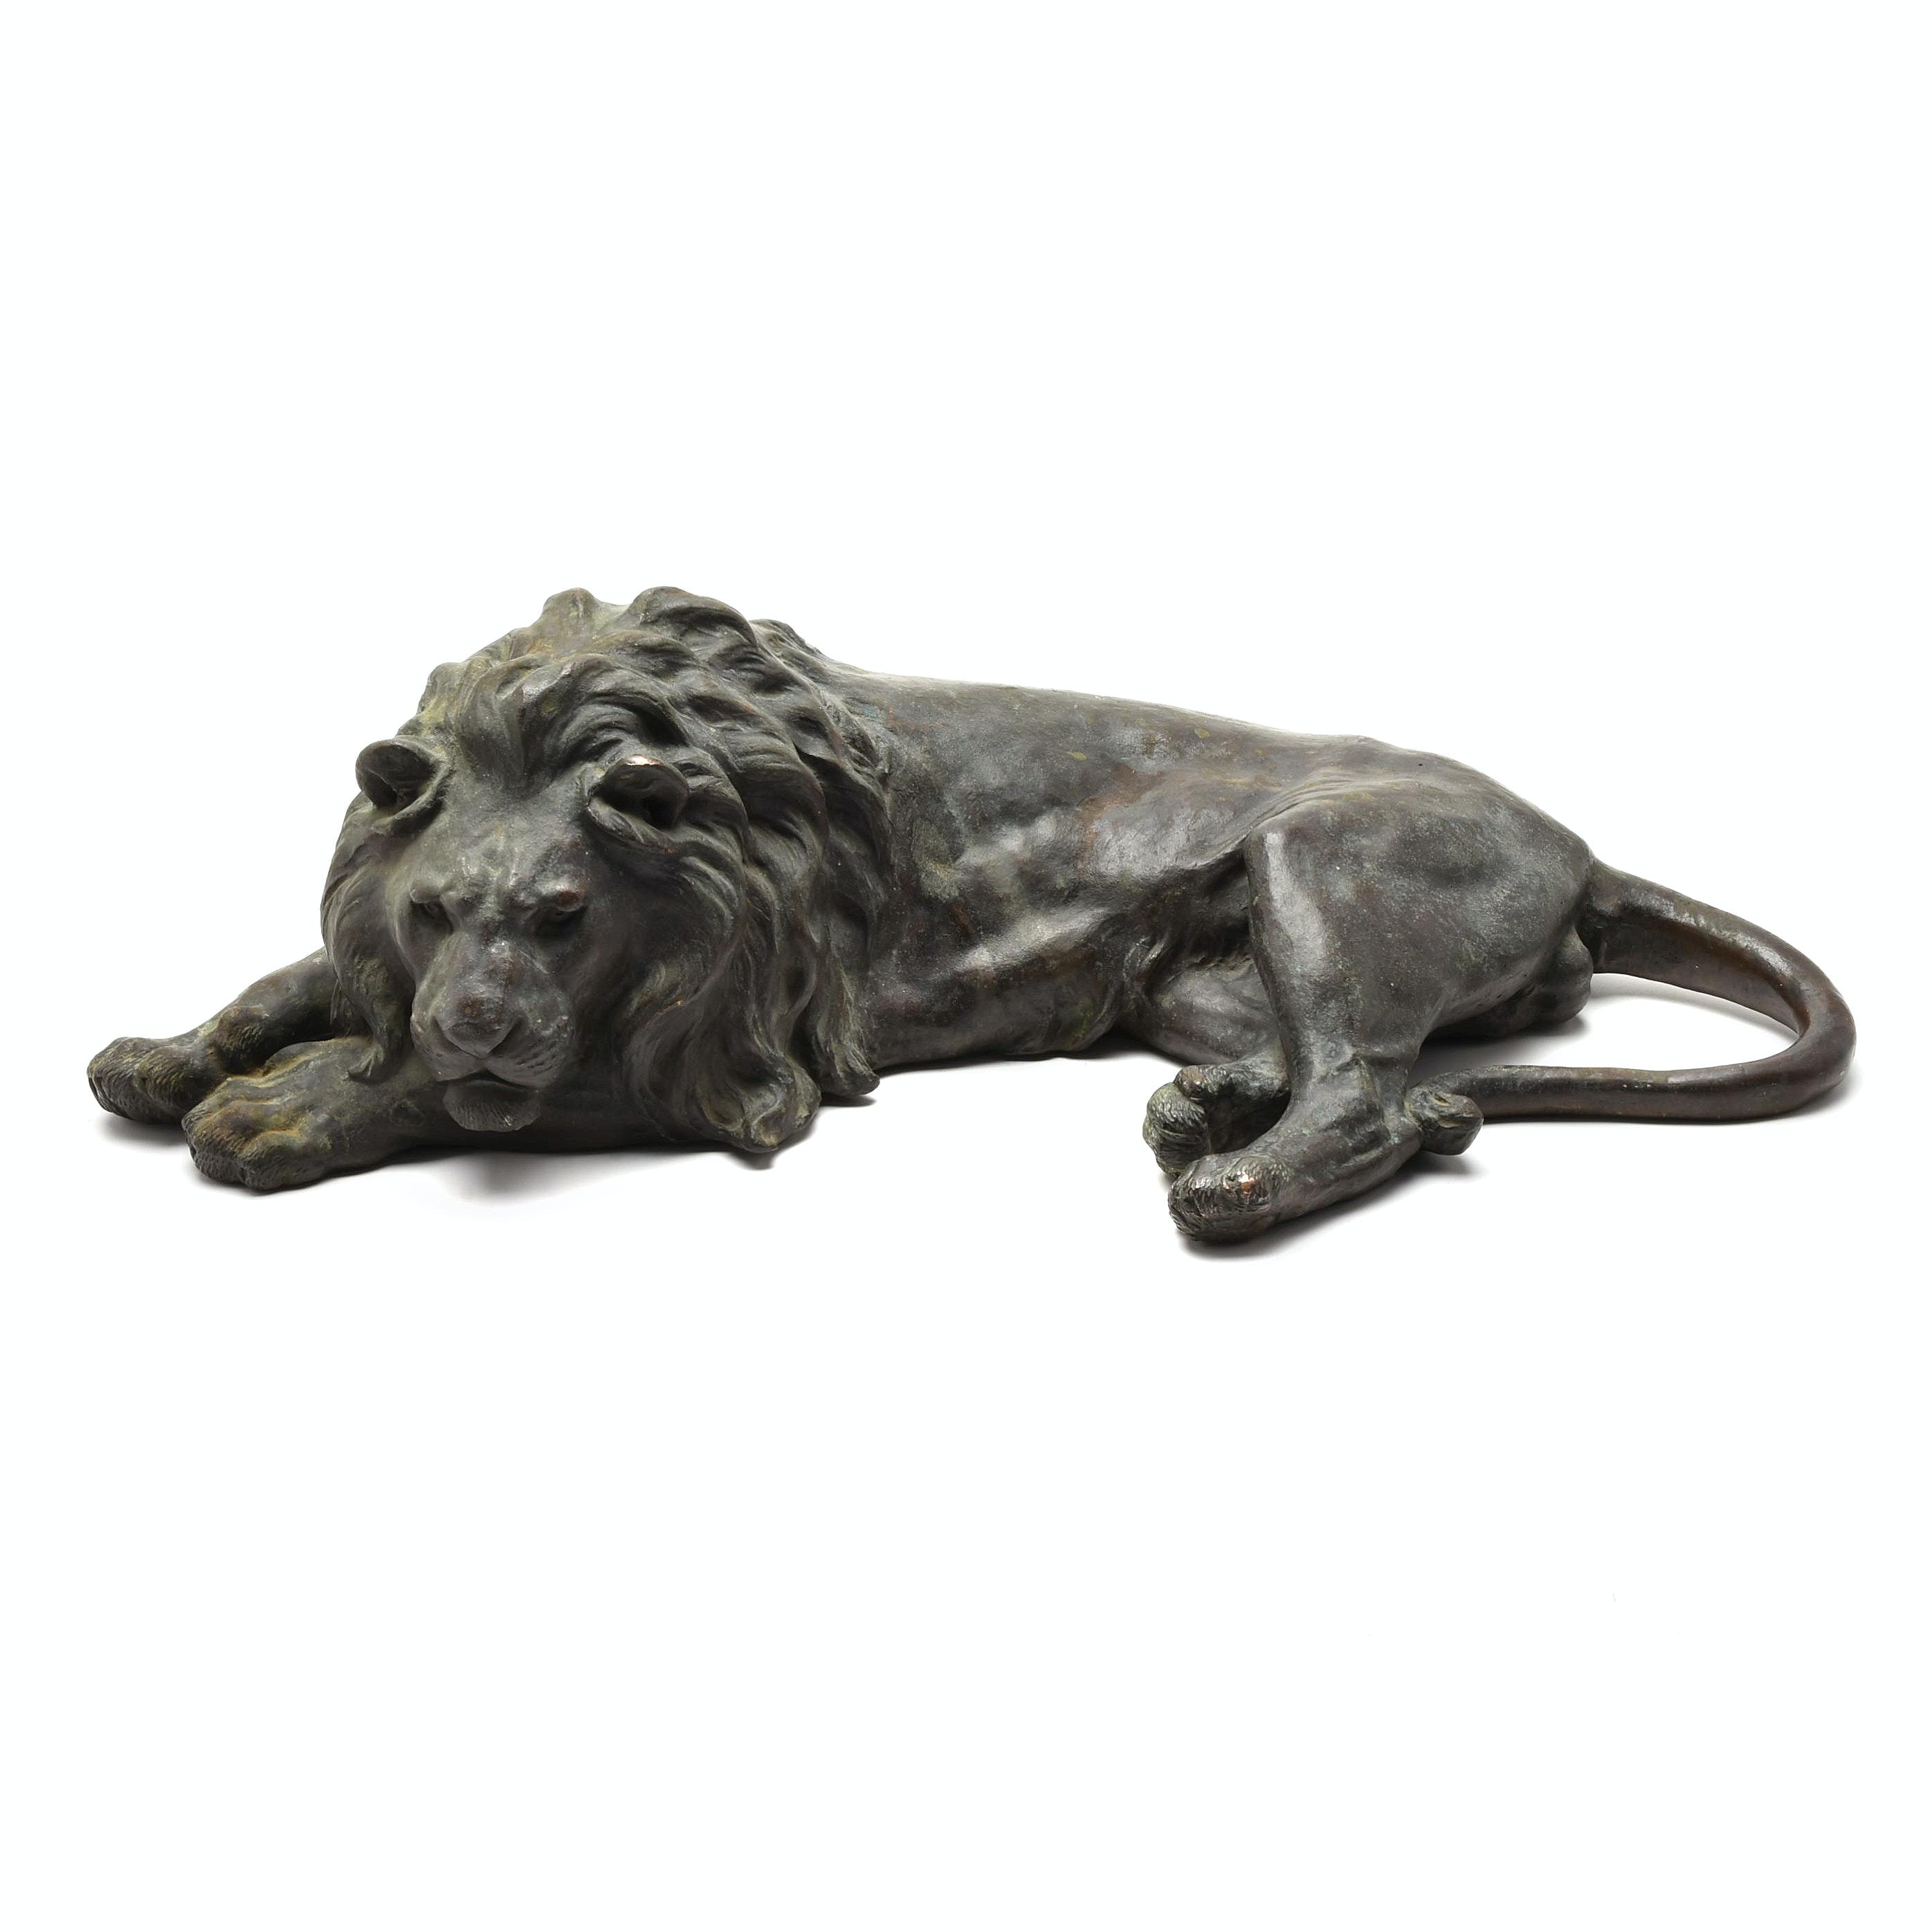 Japanese Masatsune Meiji Period Cast Bronze Laying Lion Sculpture